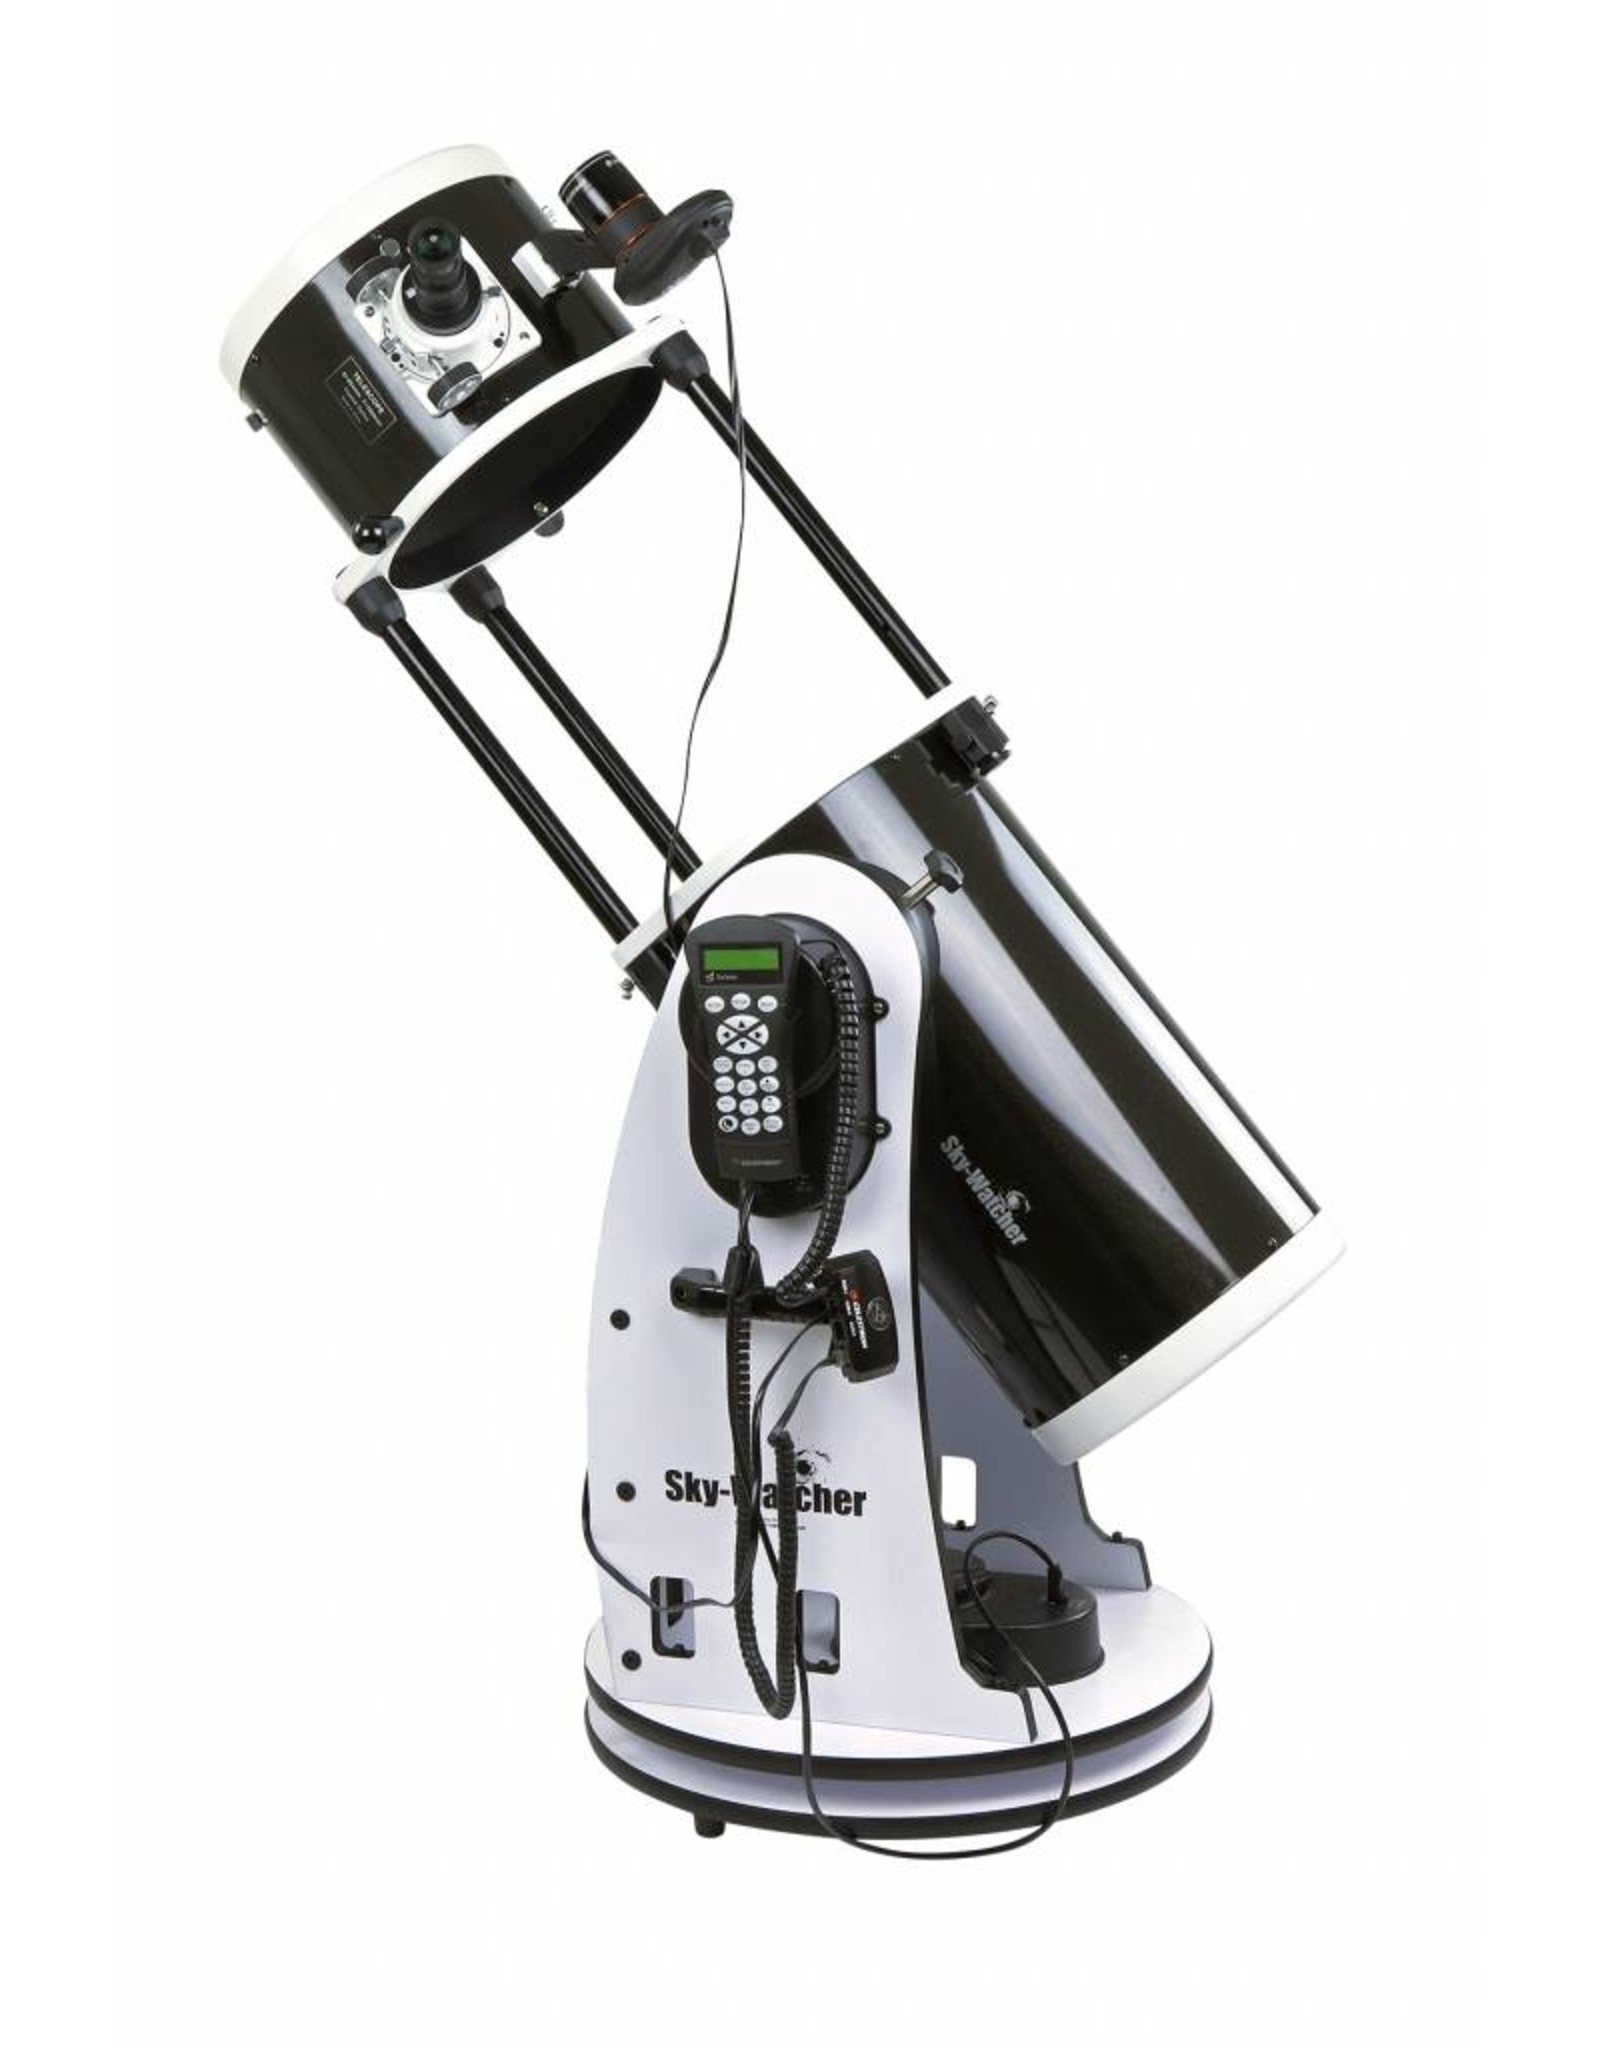 Celestron Celestron StarSense AutoAlign for Sky-Watcher Mounts